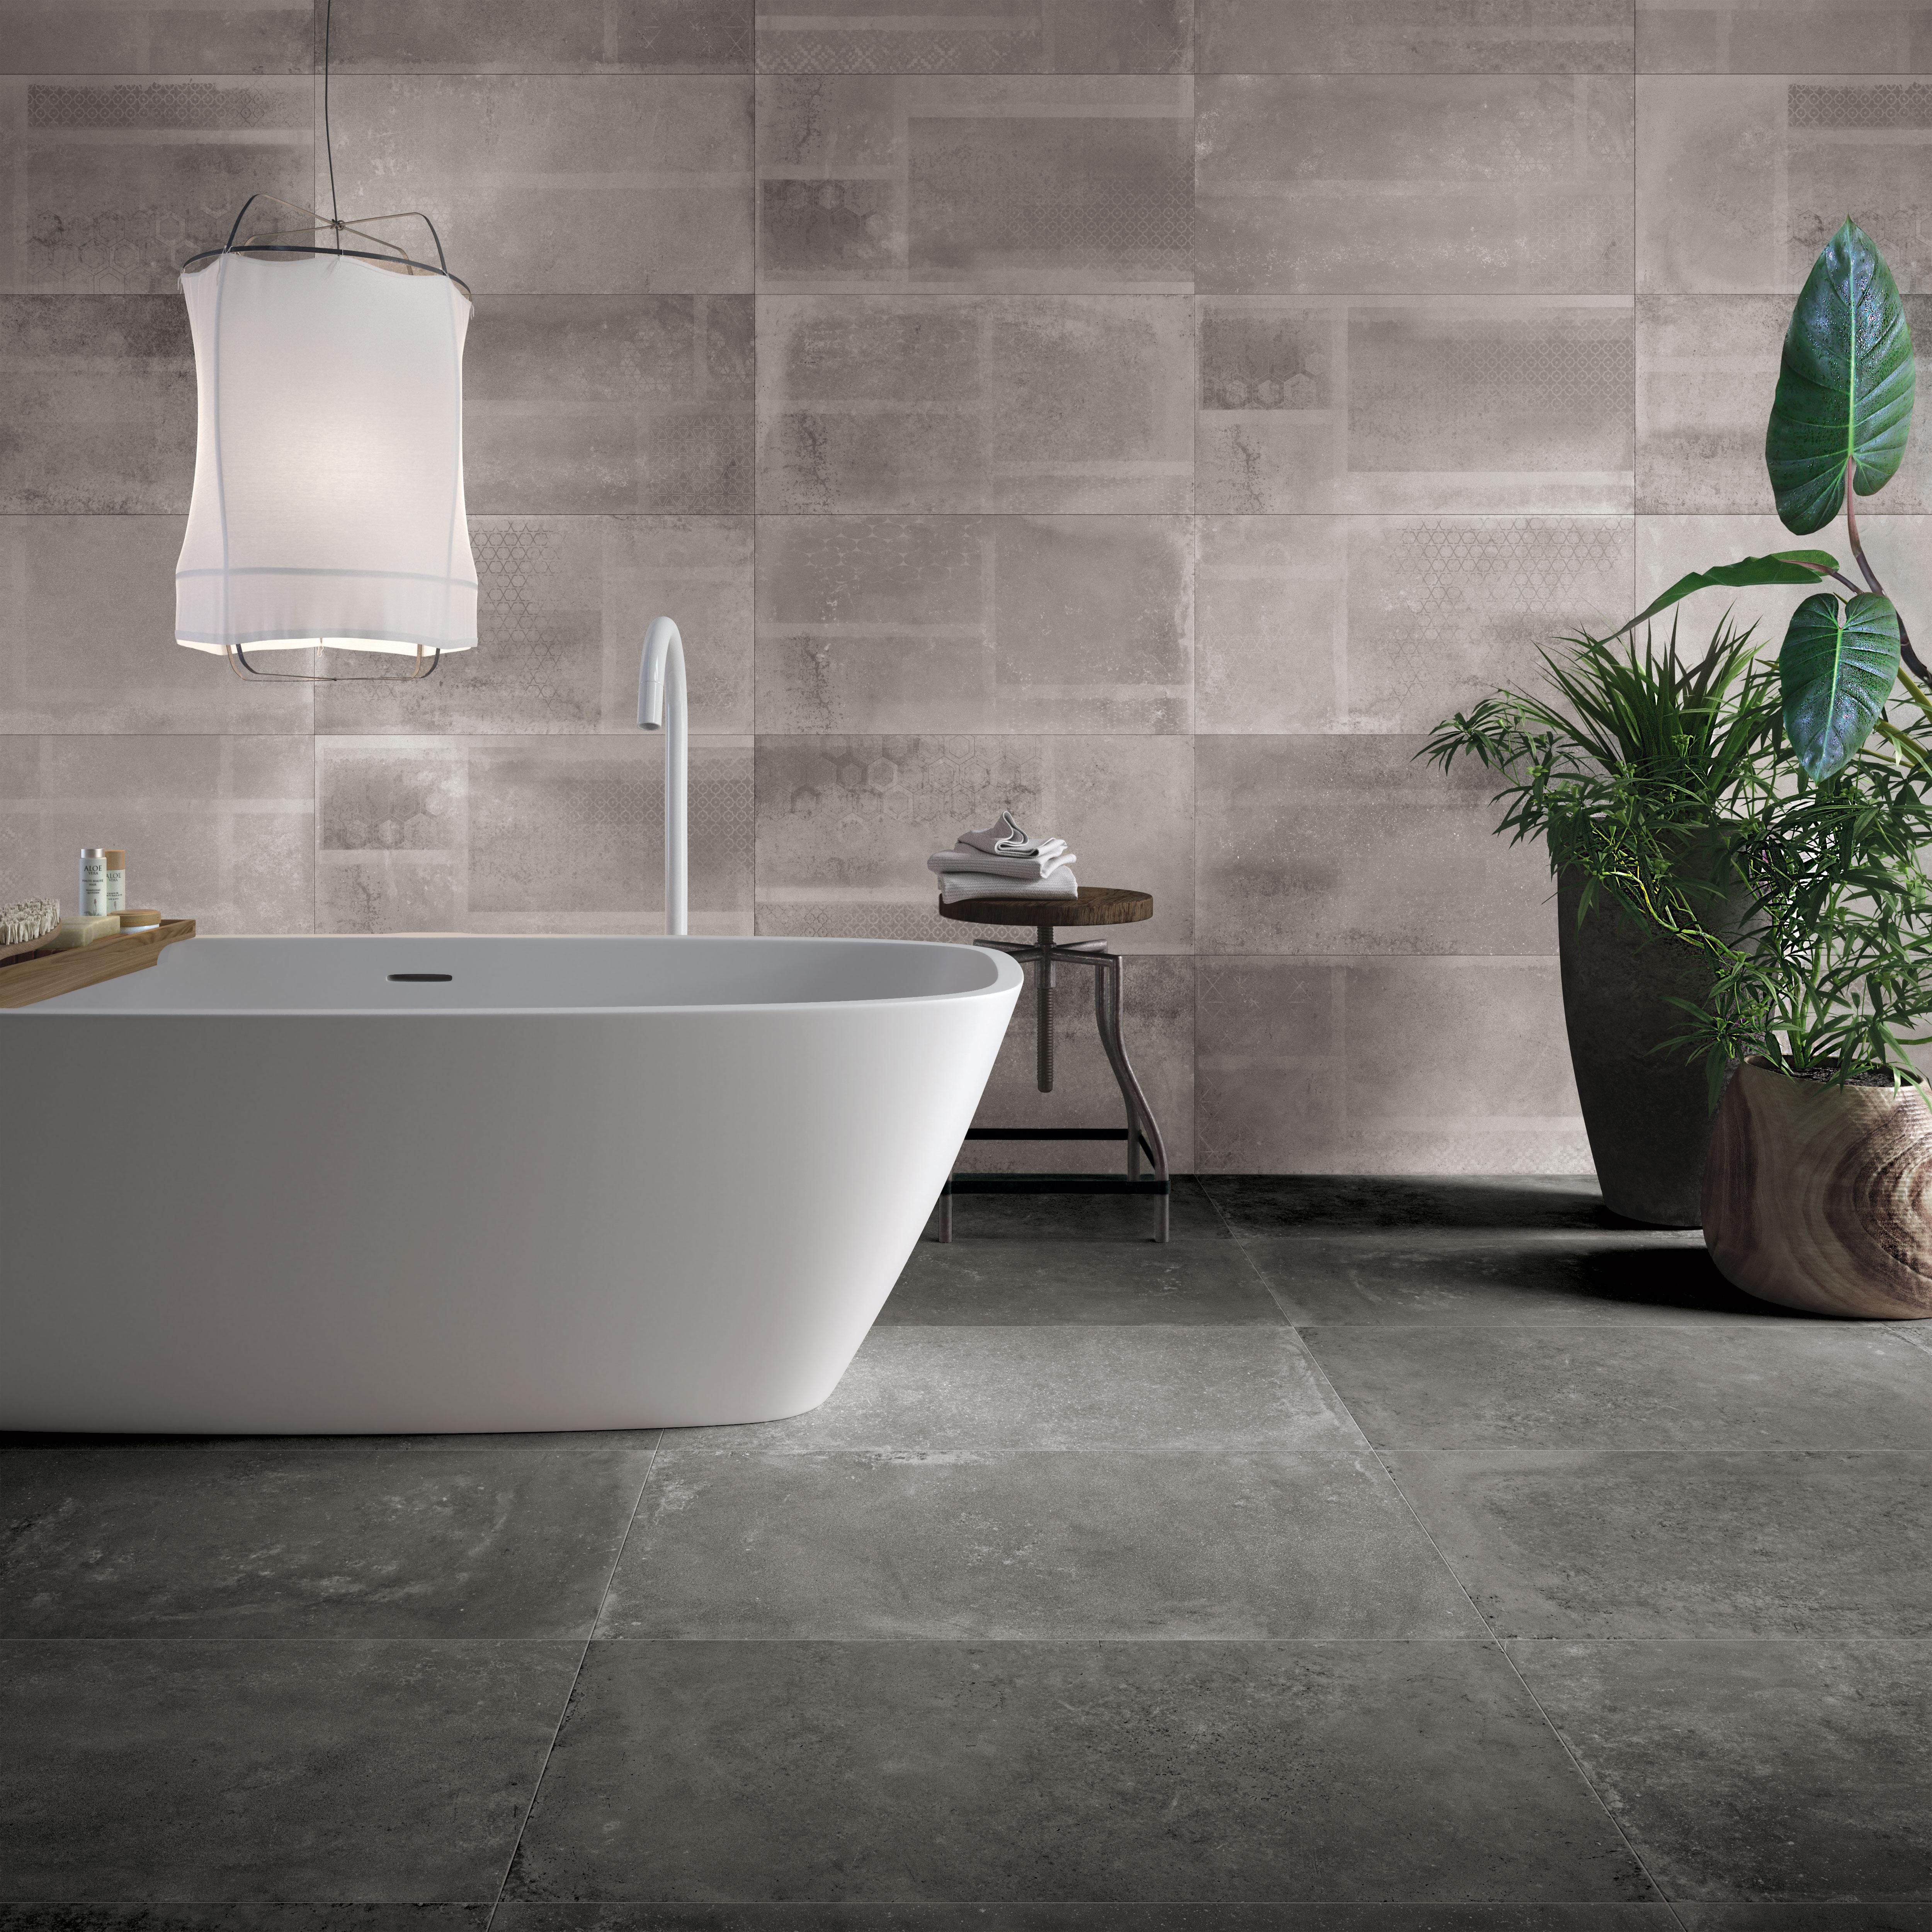 nl funvit luxe badkamer ideeen